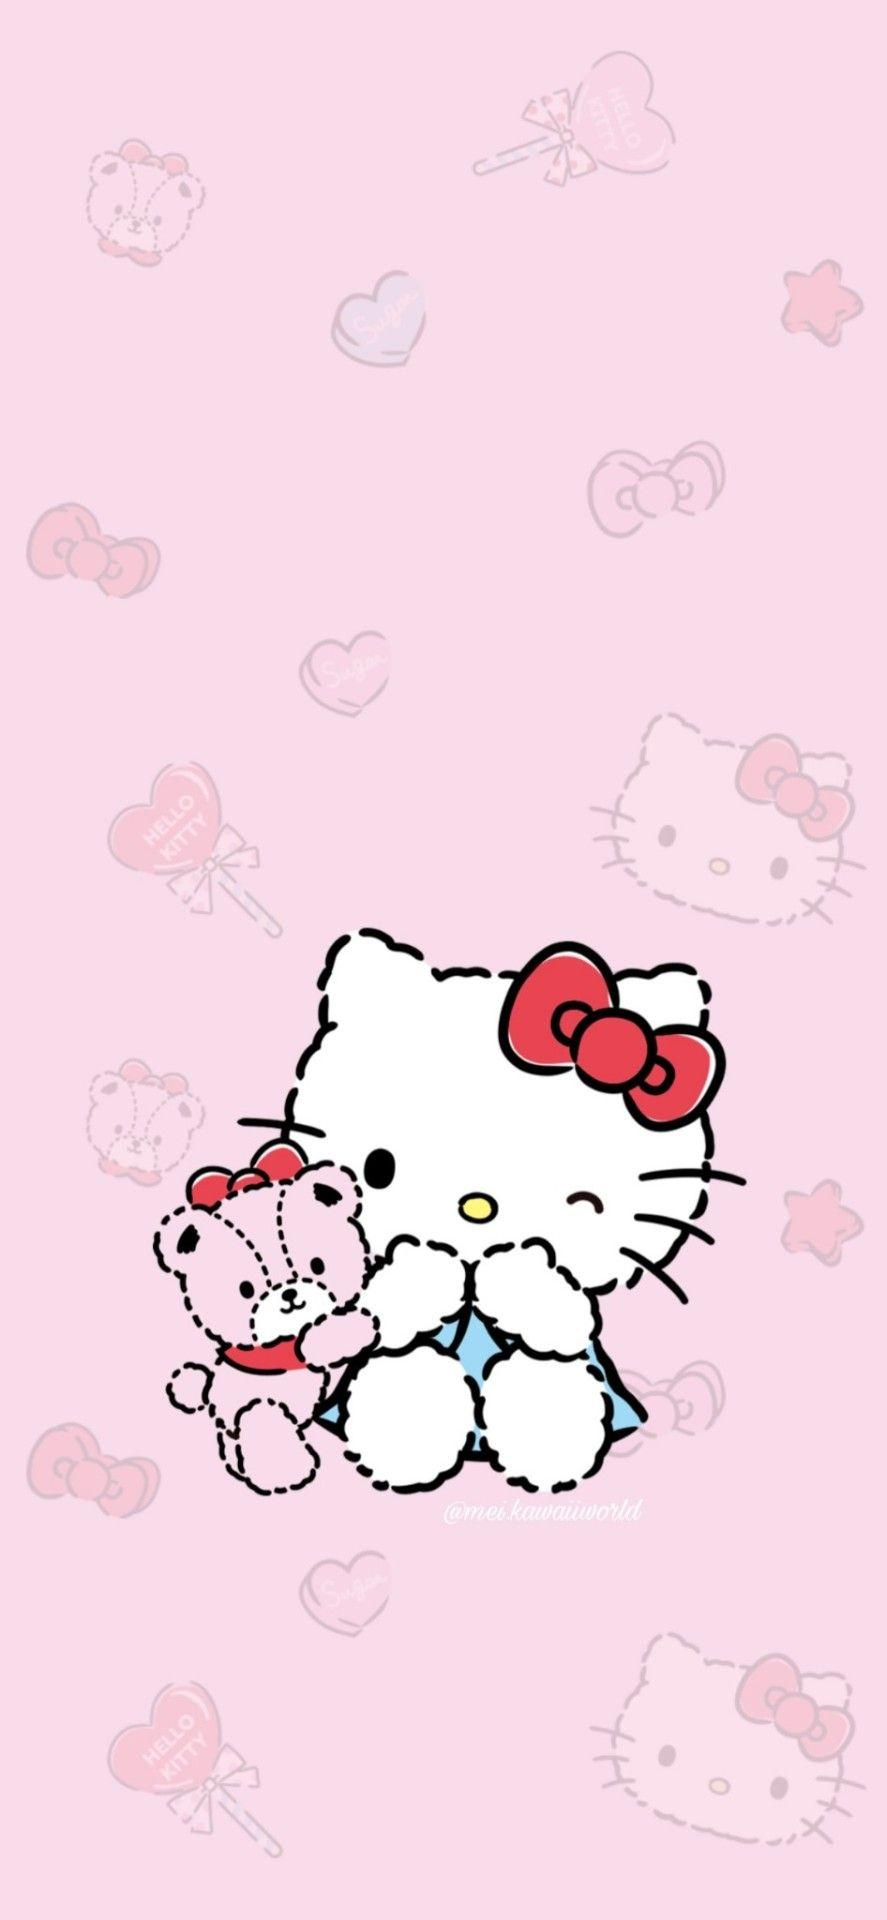 Kawaii Wallpapers Page Hello Kitty Phone Wallpaper Hello Kitty Wallpaper Hello Kitty